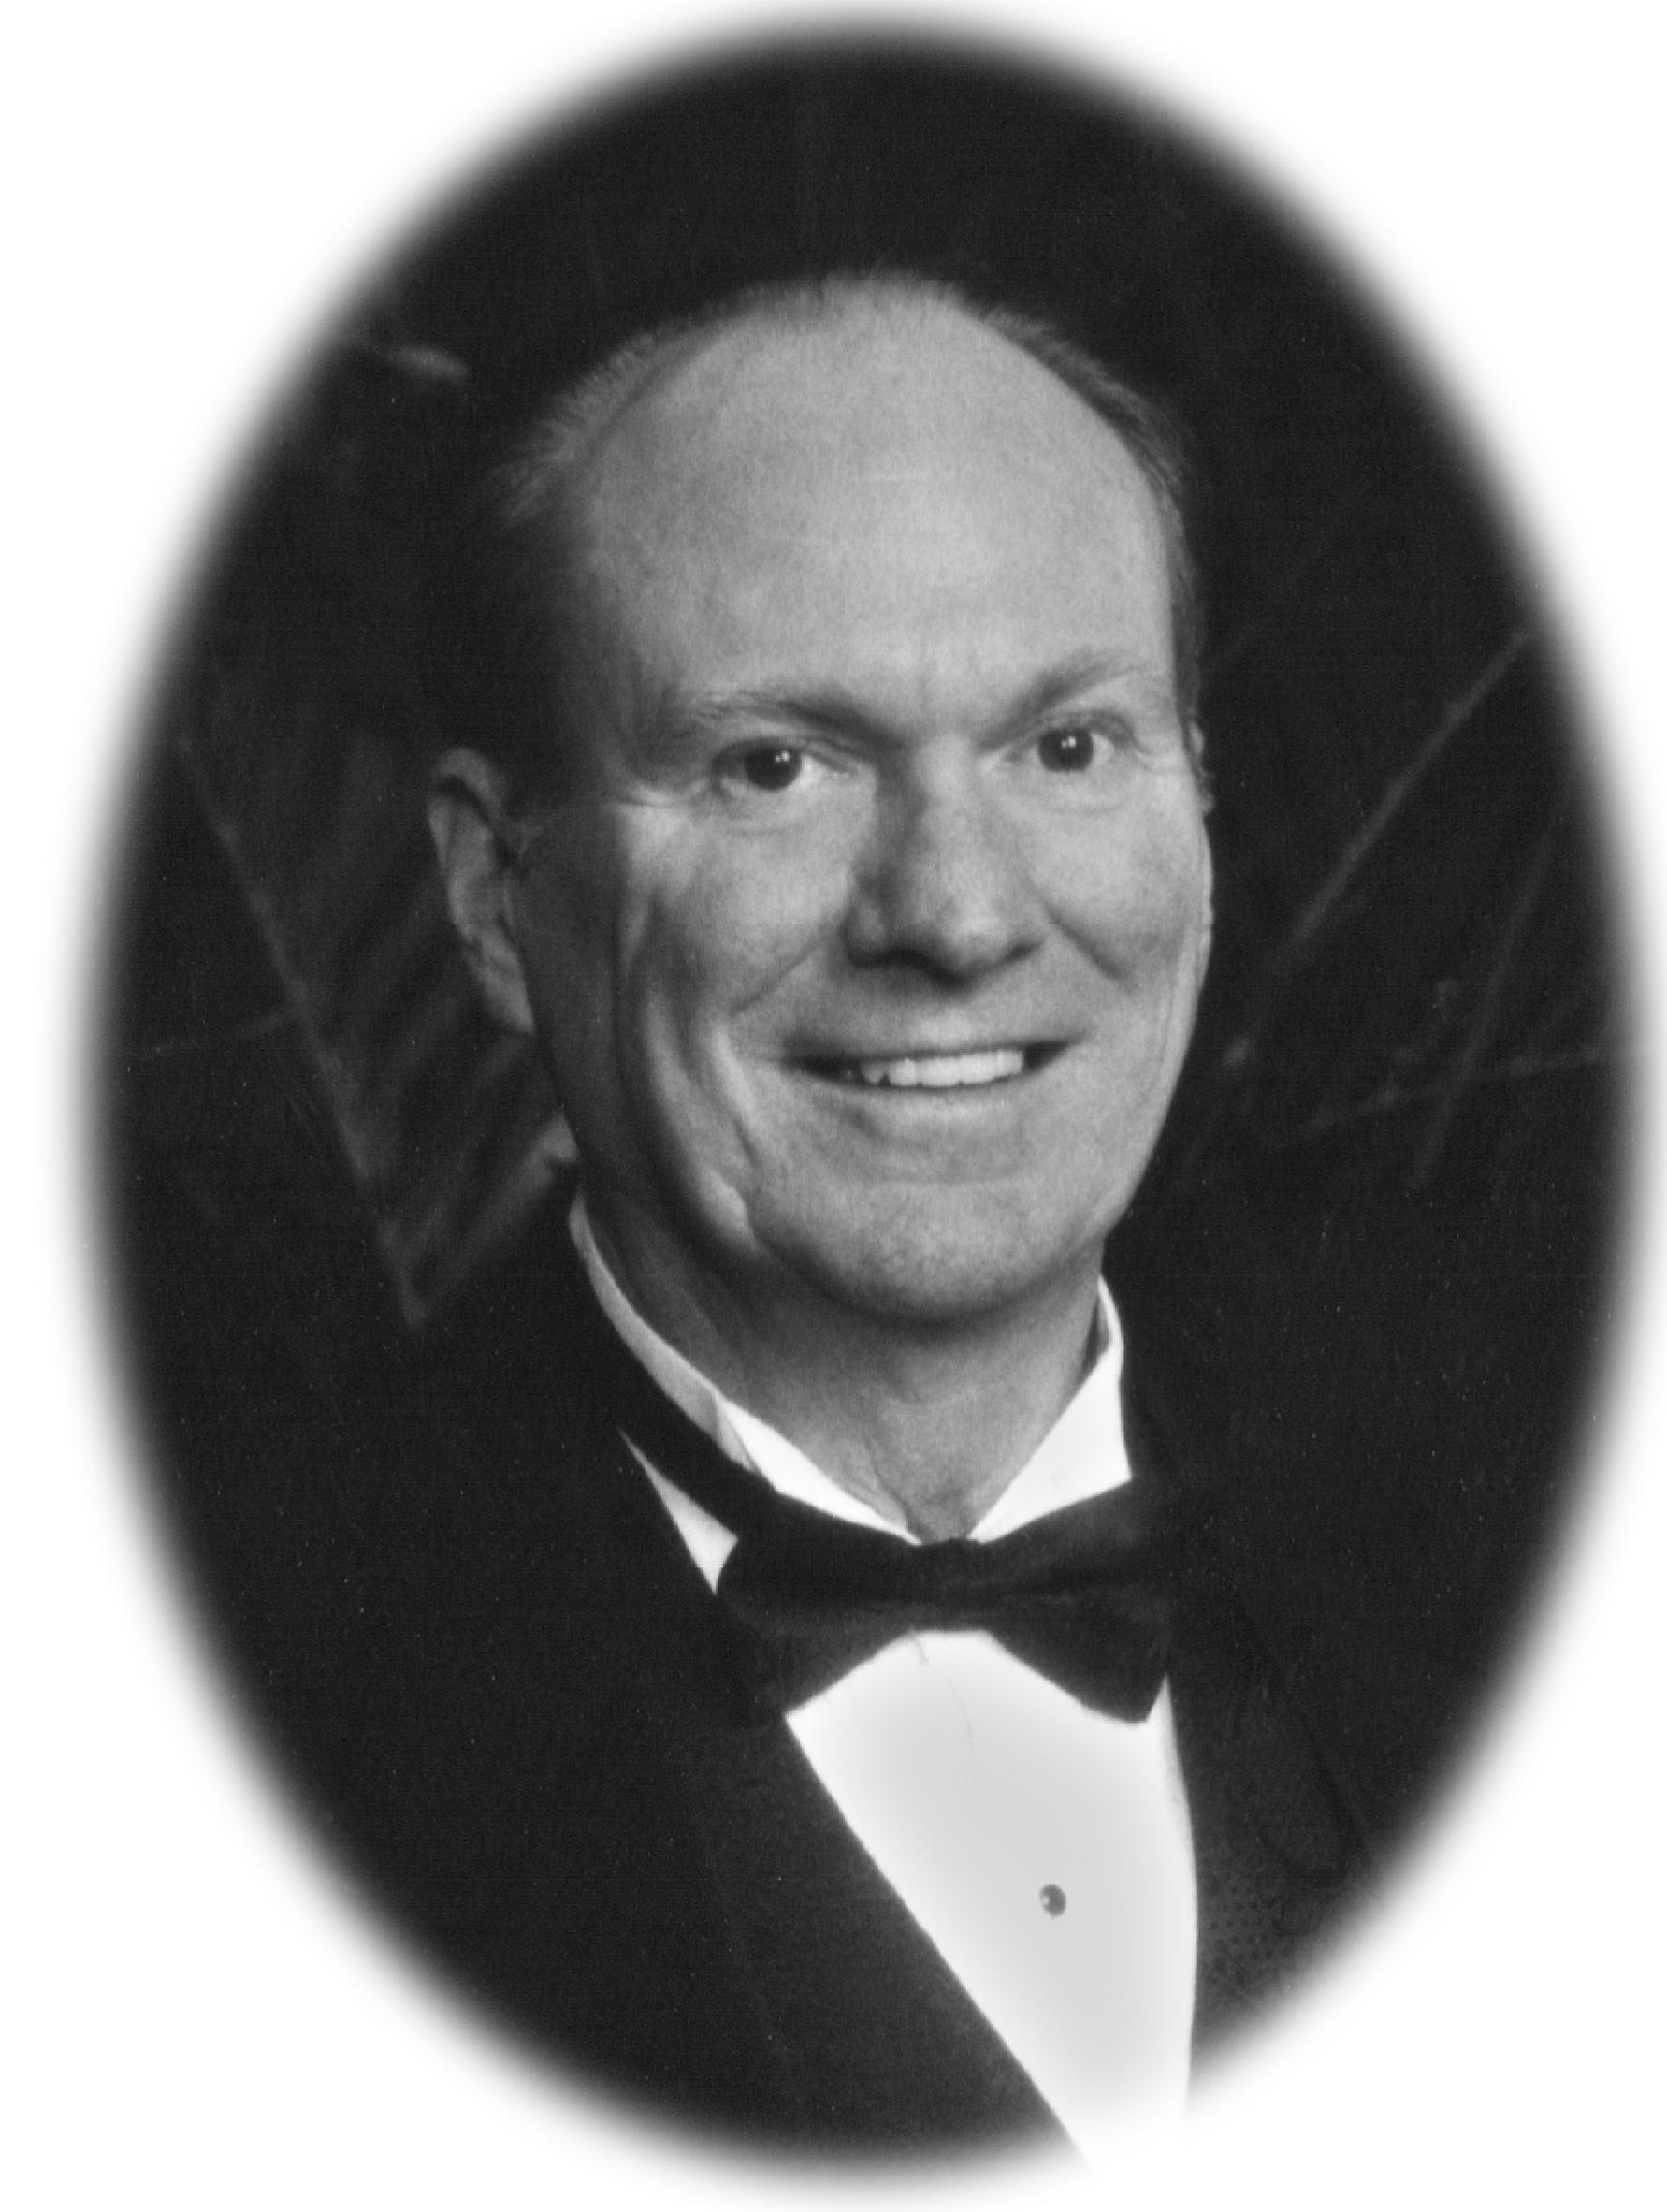 David William Ayrault